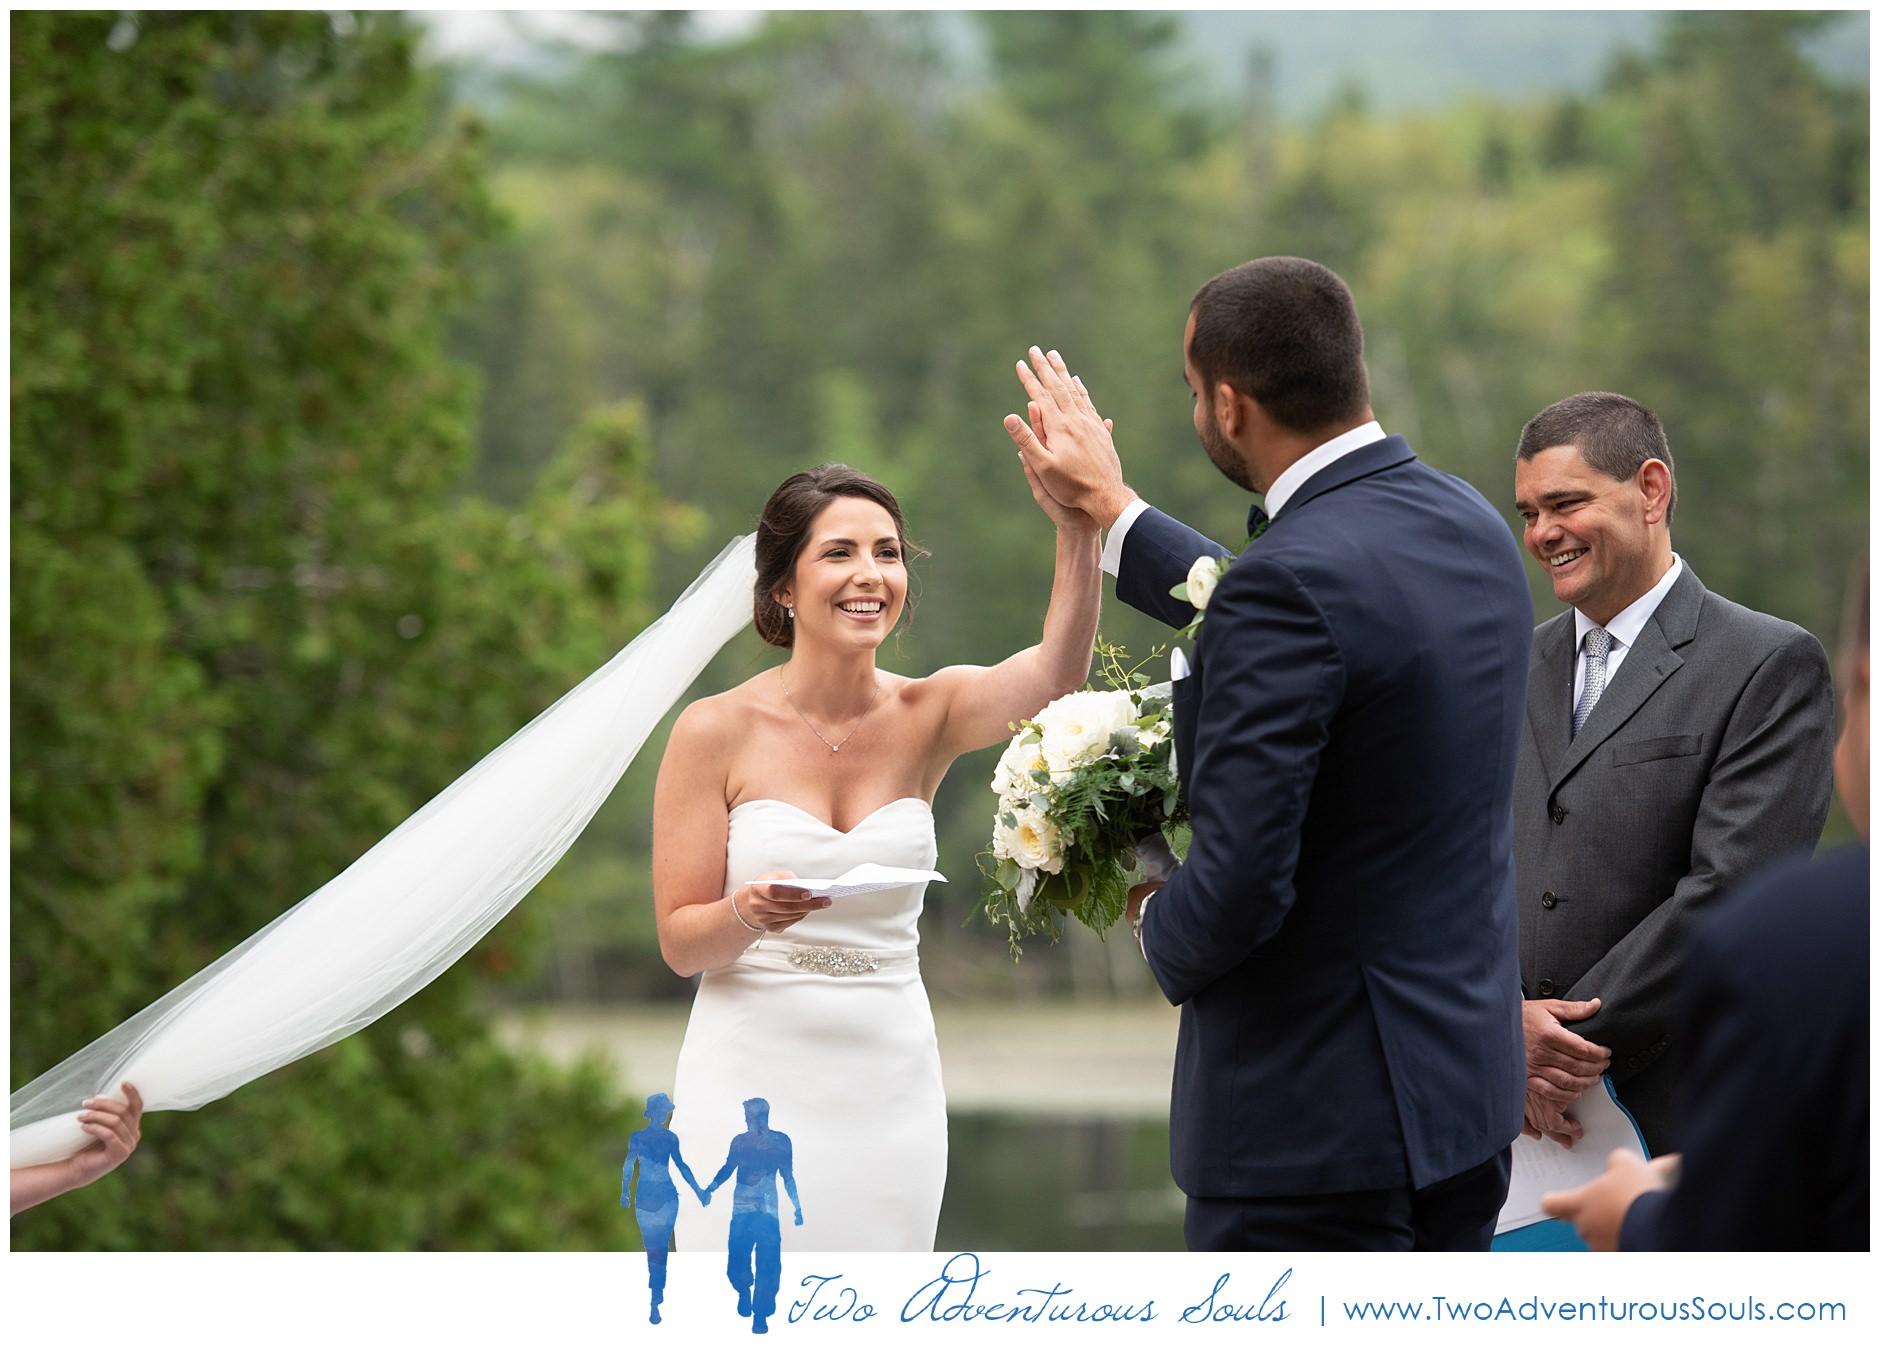 Sugarloaf Outdoor Center Wedding Photographers, Destination Wedding Photographers, Two Adventurous Souls-081719_0039.jpg